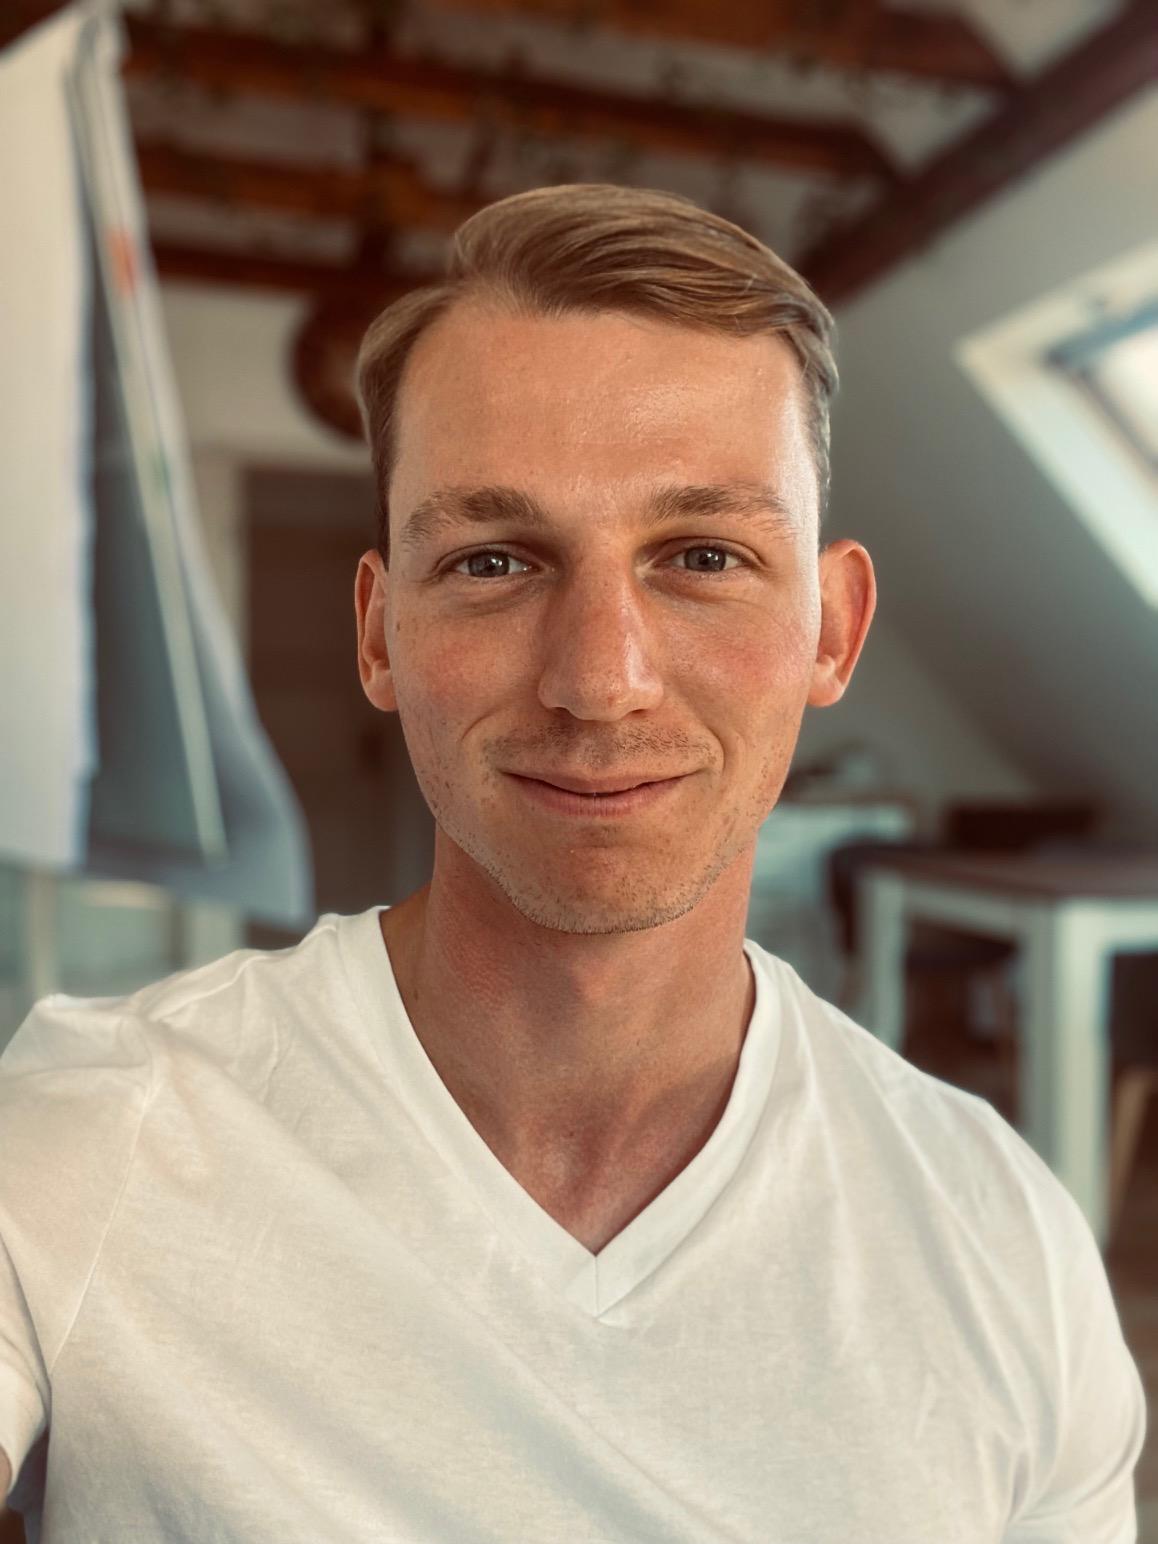 Personal Trainer Bonn